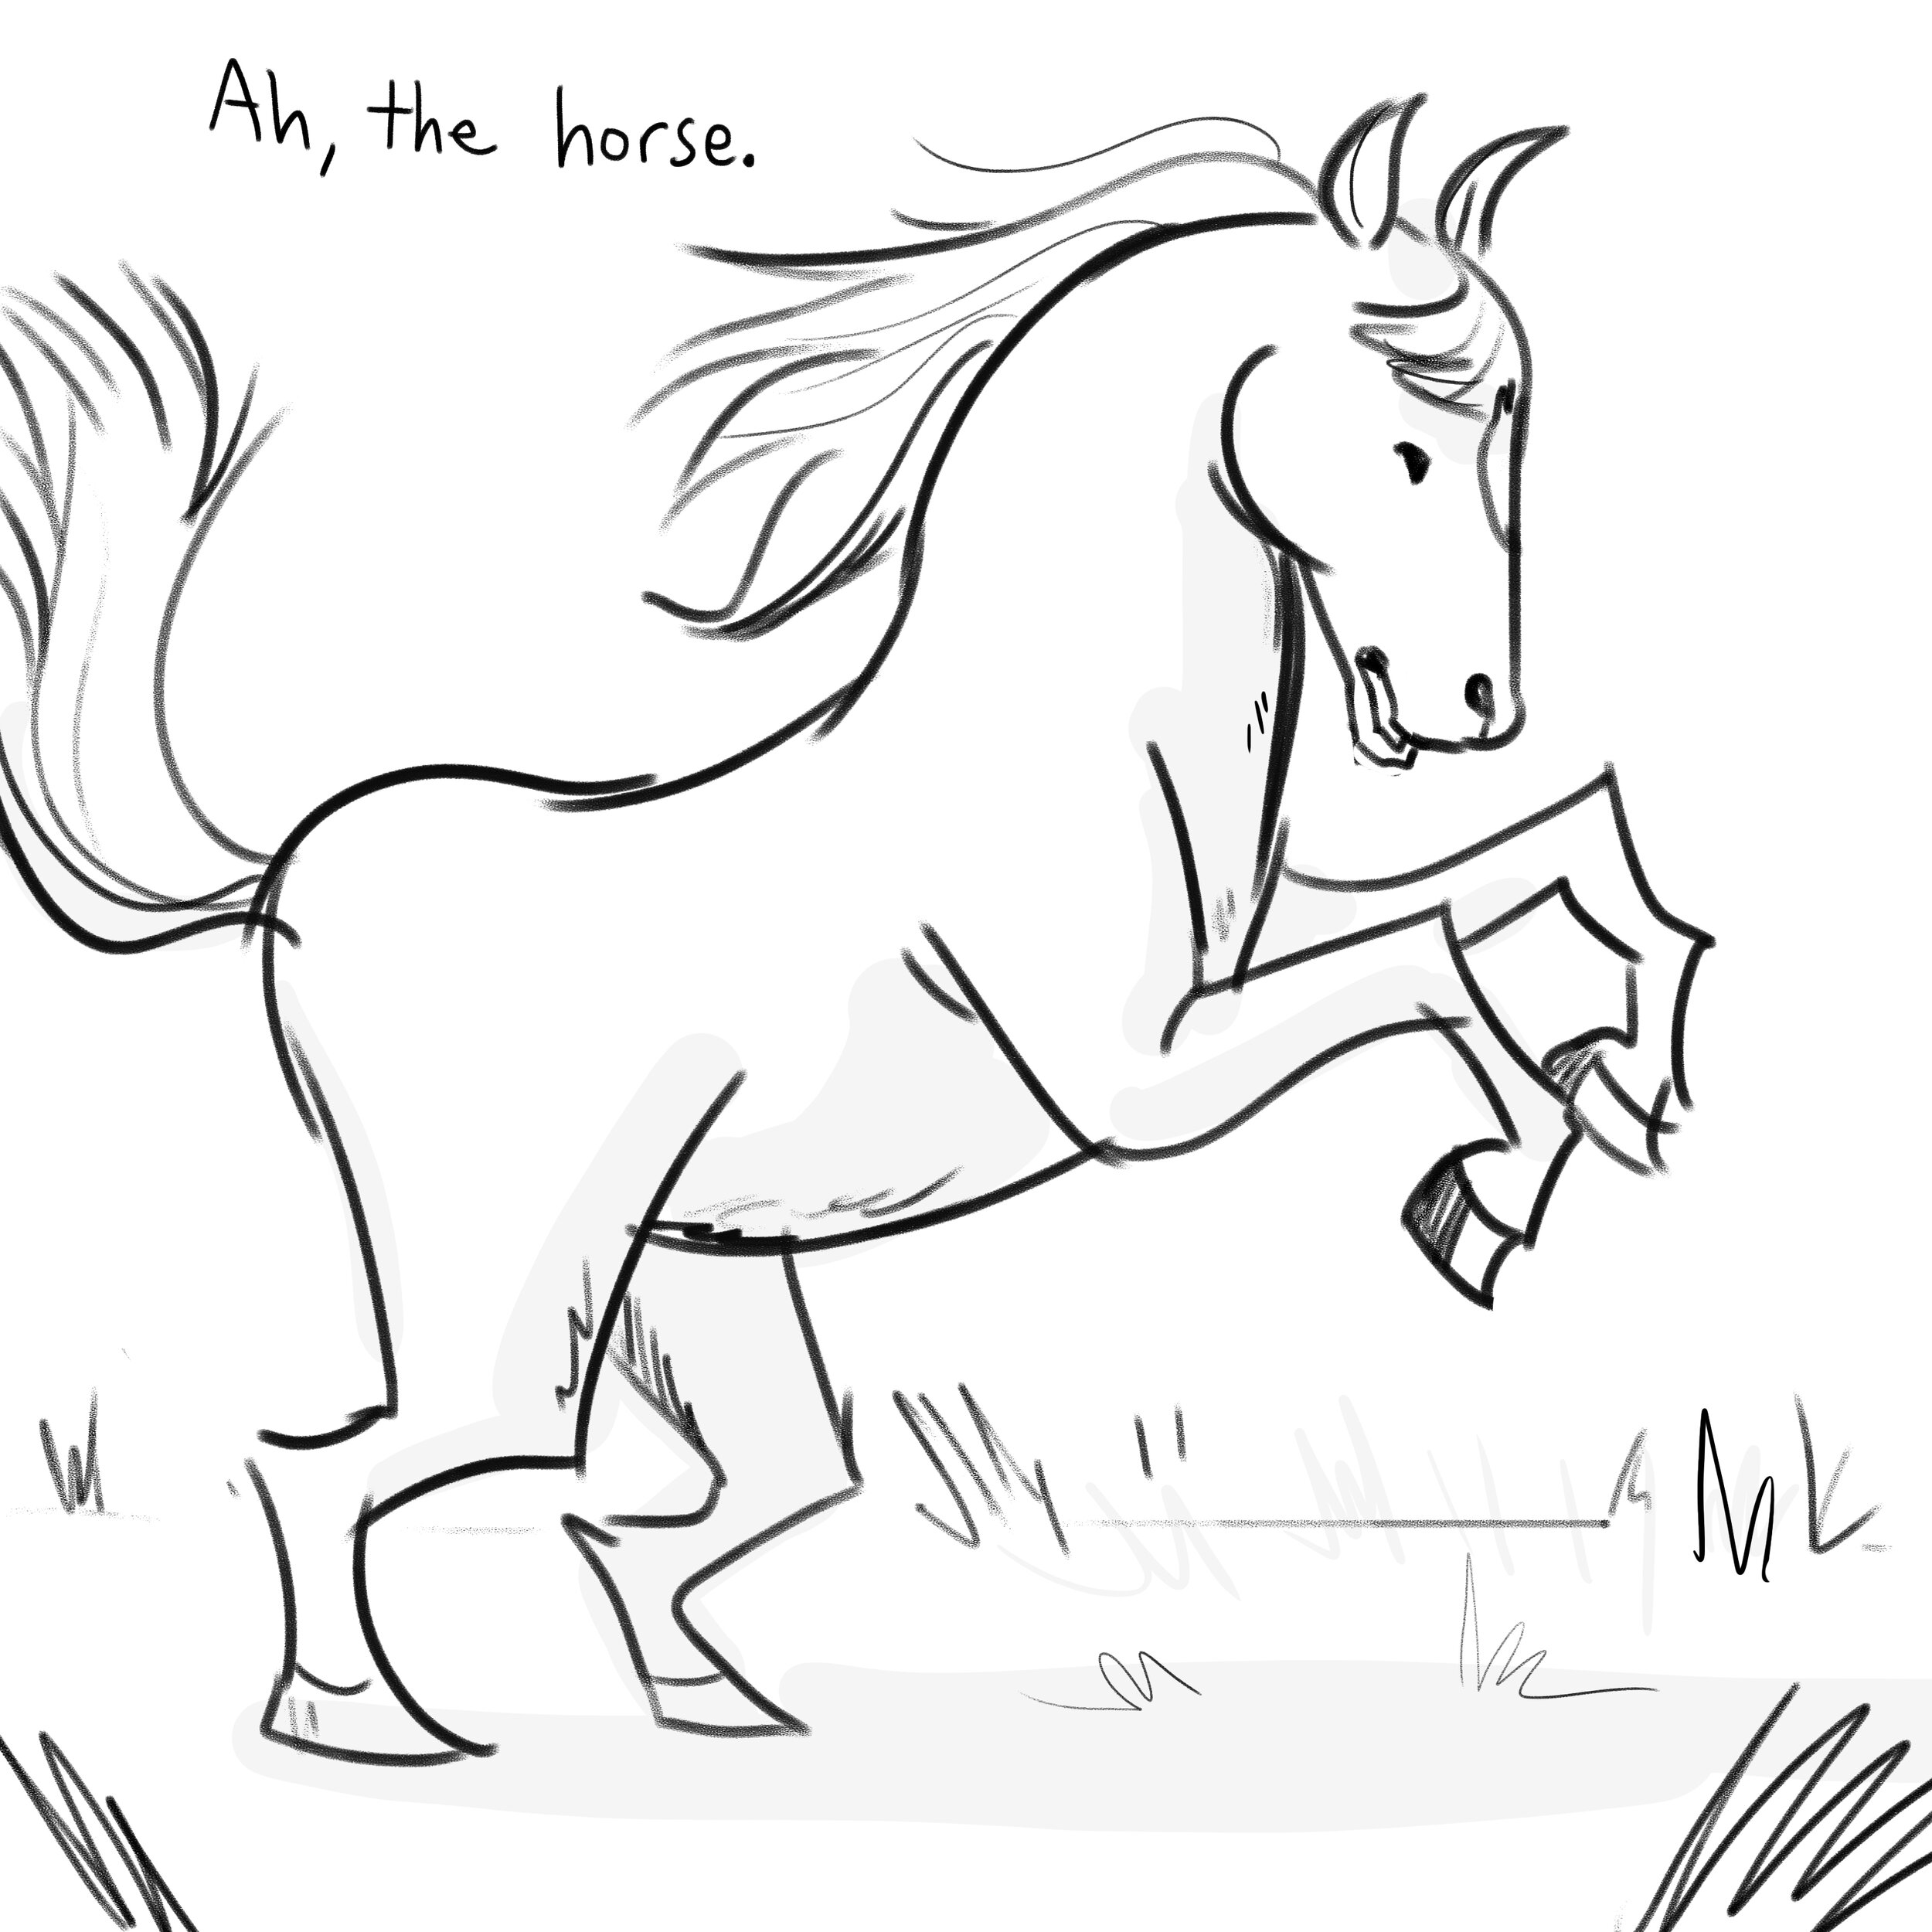 horses comic pg 1.jpg